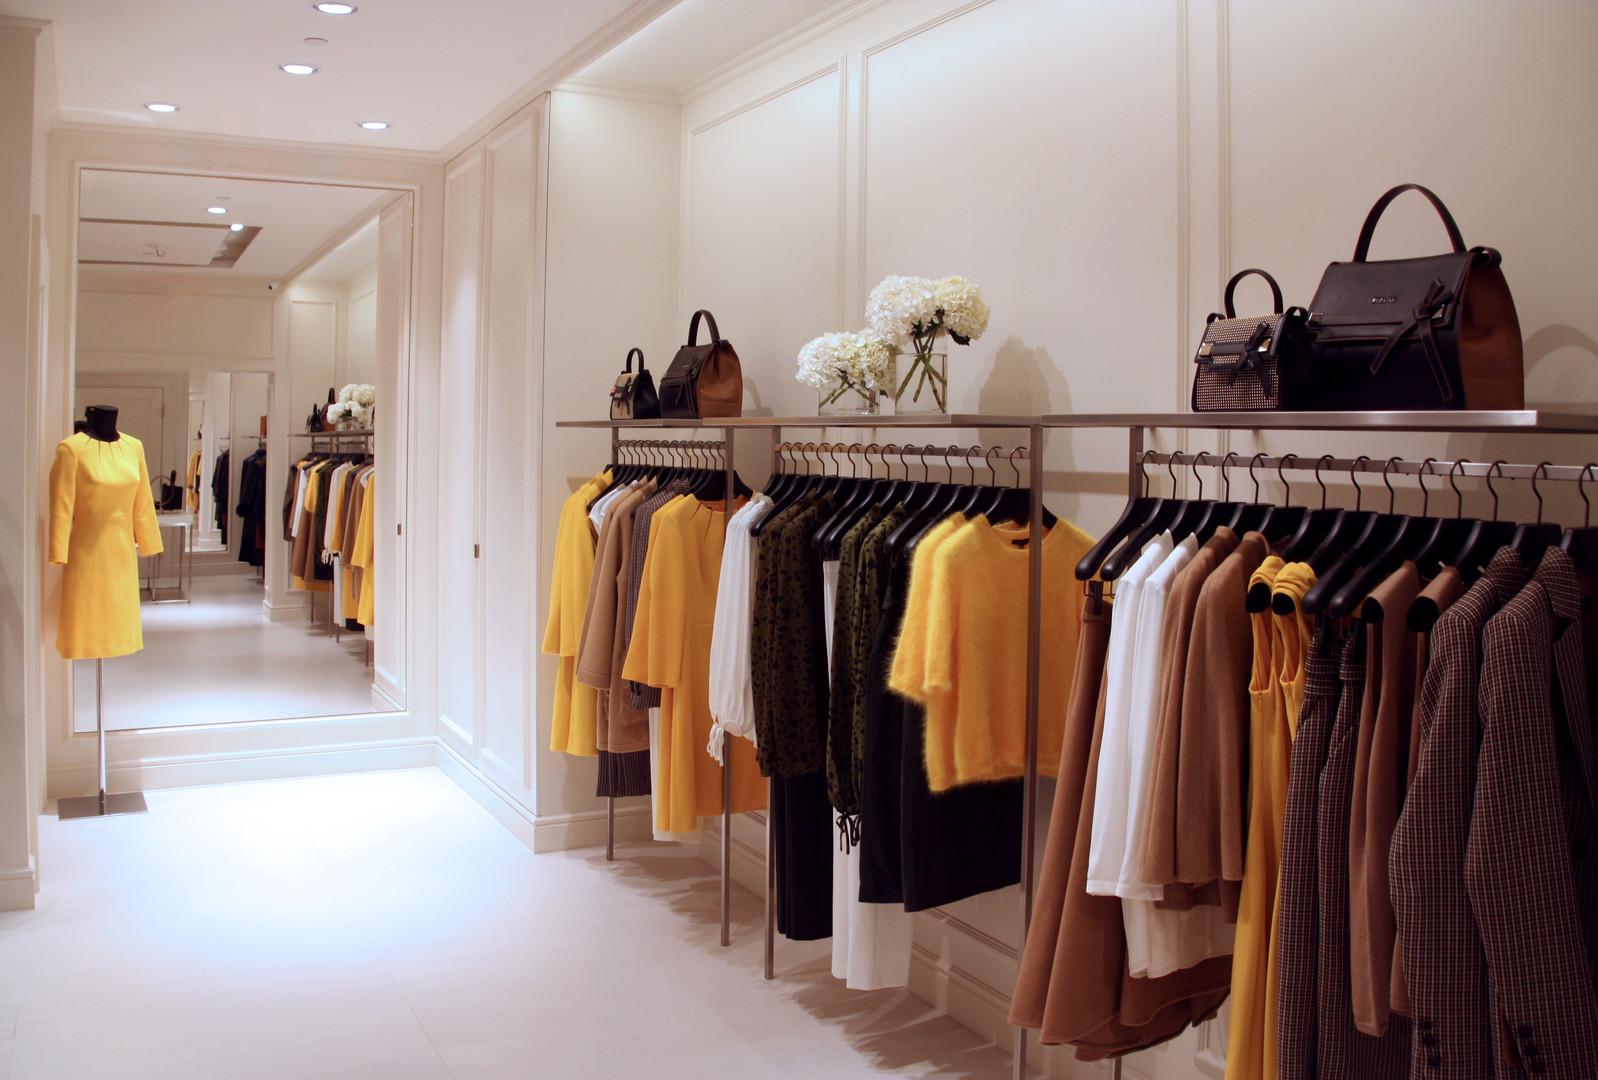 Retail-3-Right-2.jpg